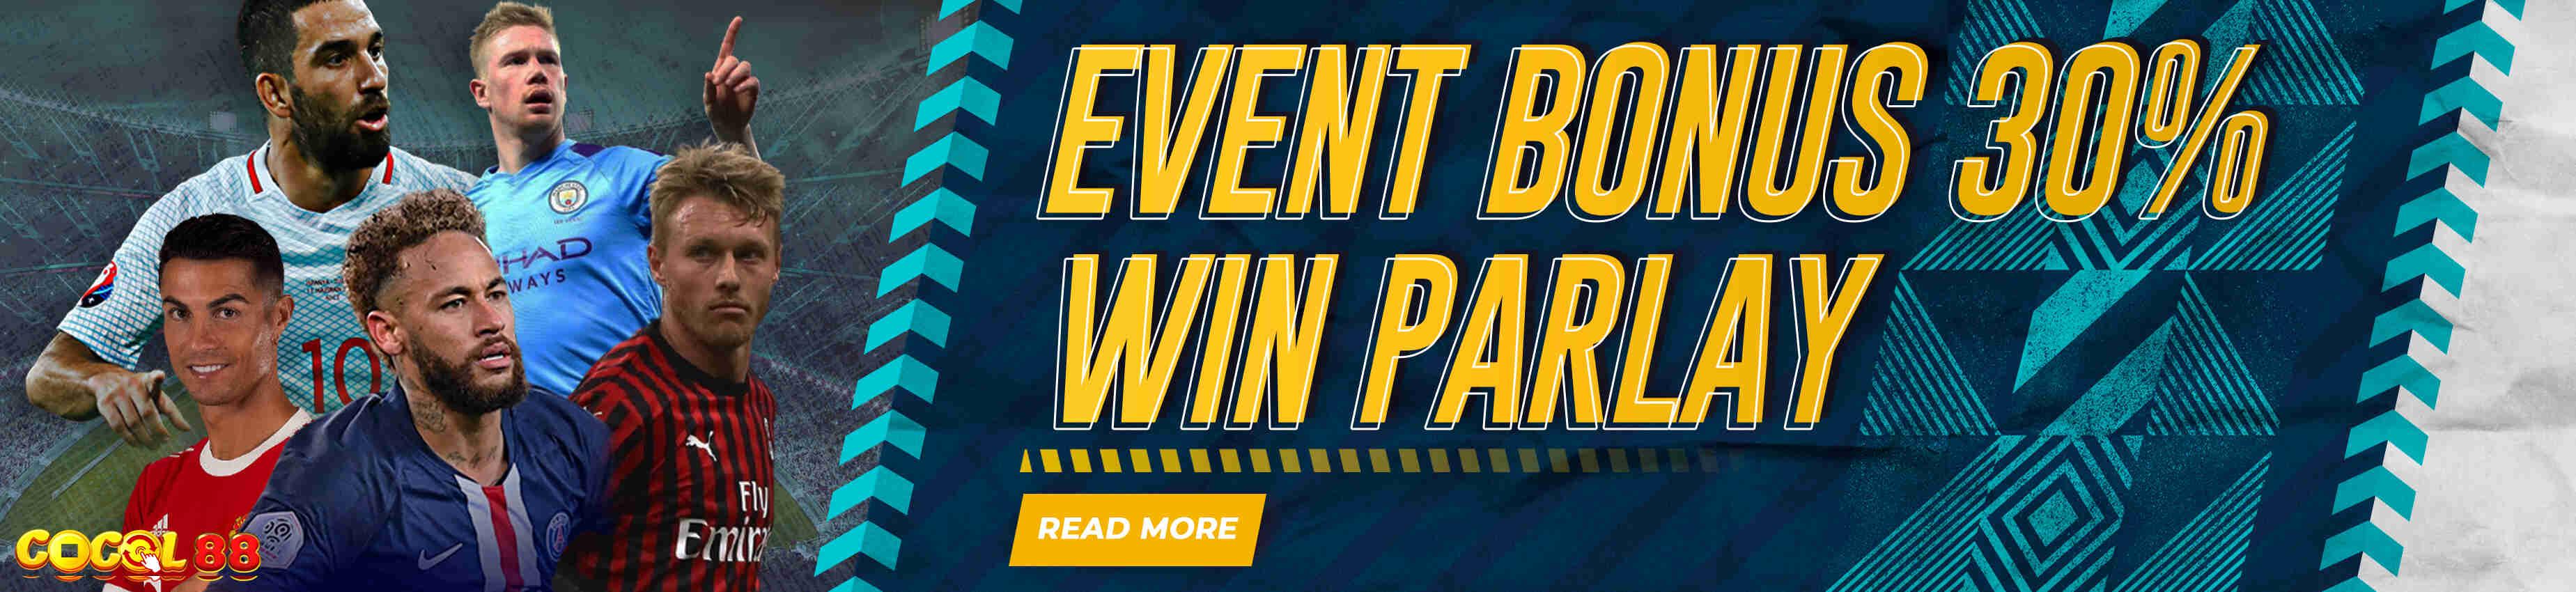 EVENT BONUS 30% WIN PARLAY COCOL88